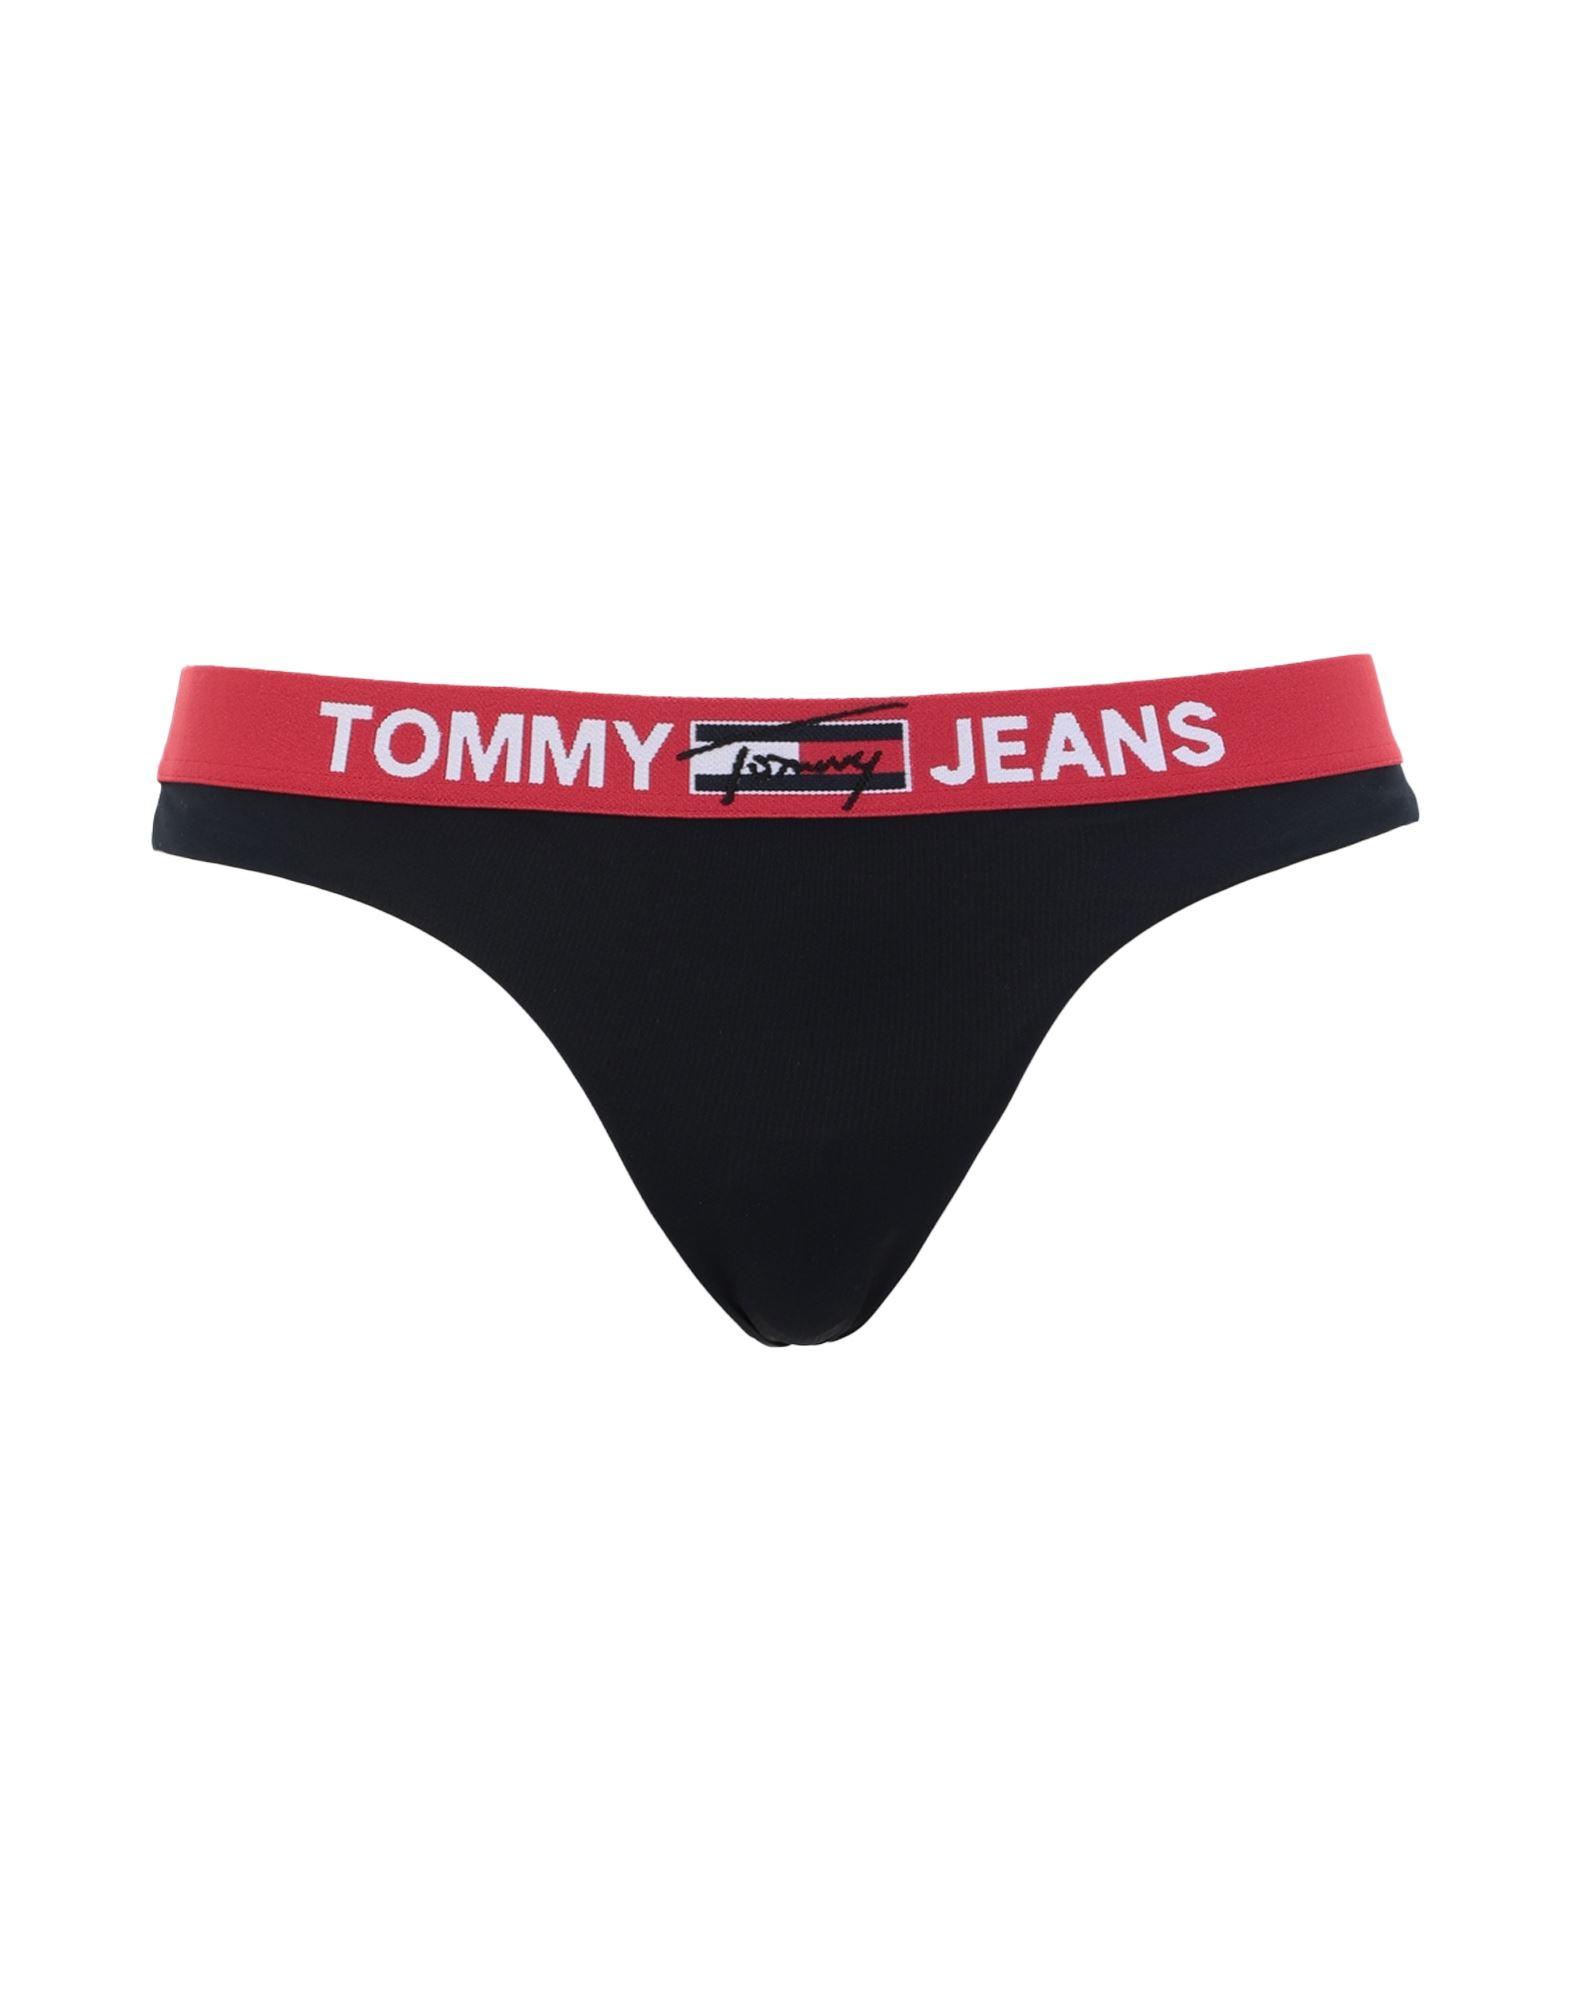 Фото - TOMMY JEANS Плавки платье tommy jeans dw0dw07907 c87 twilight navy